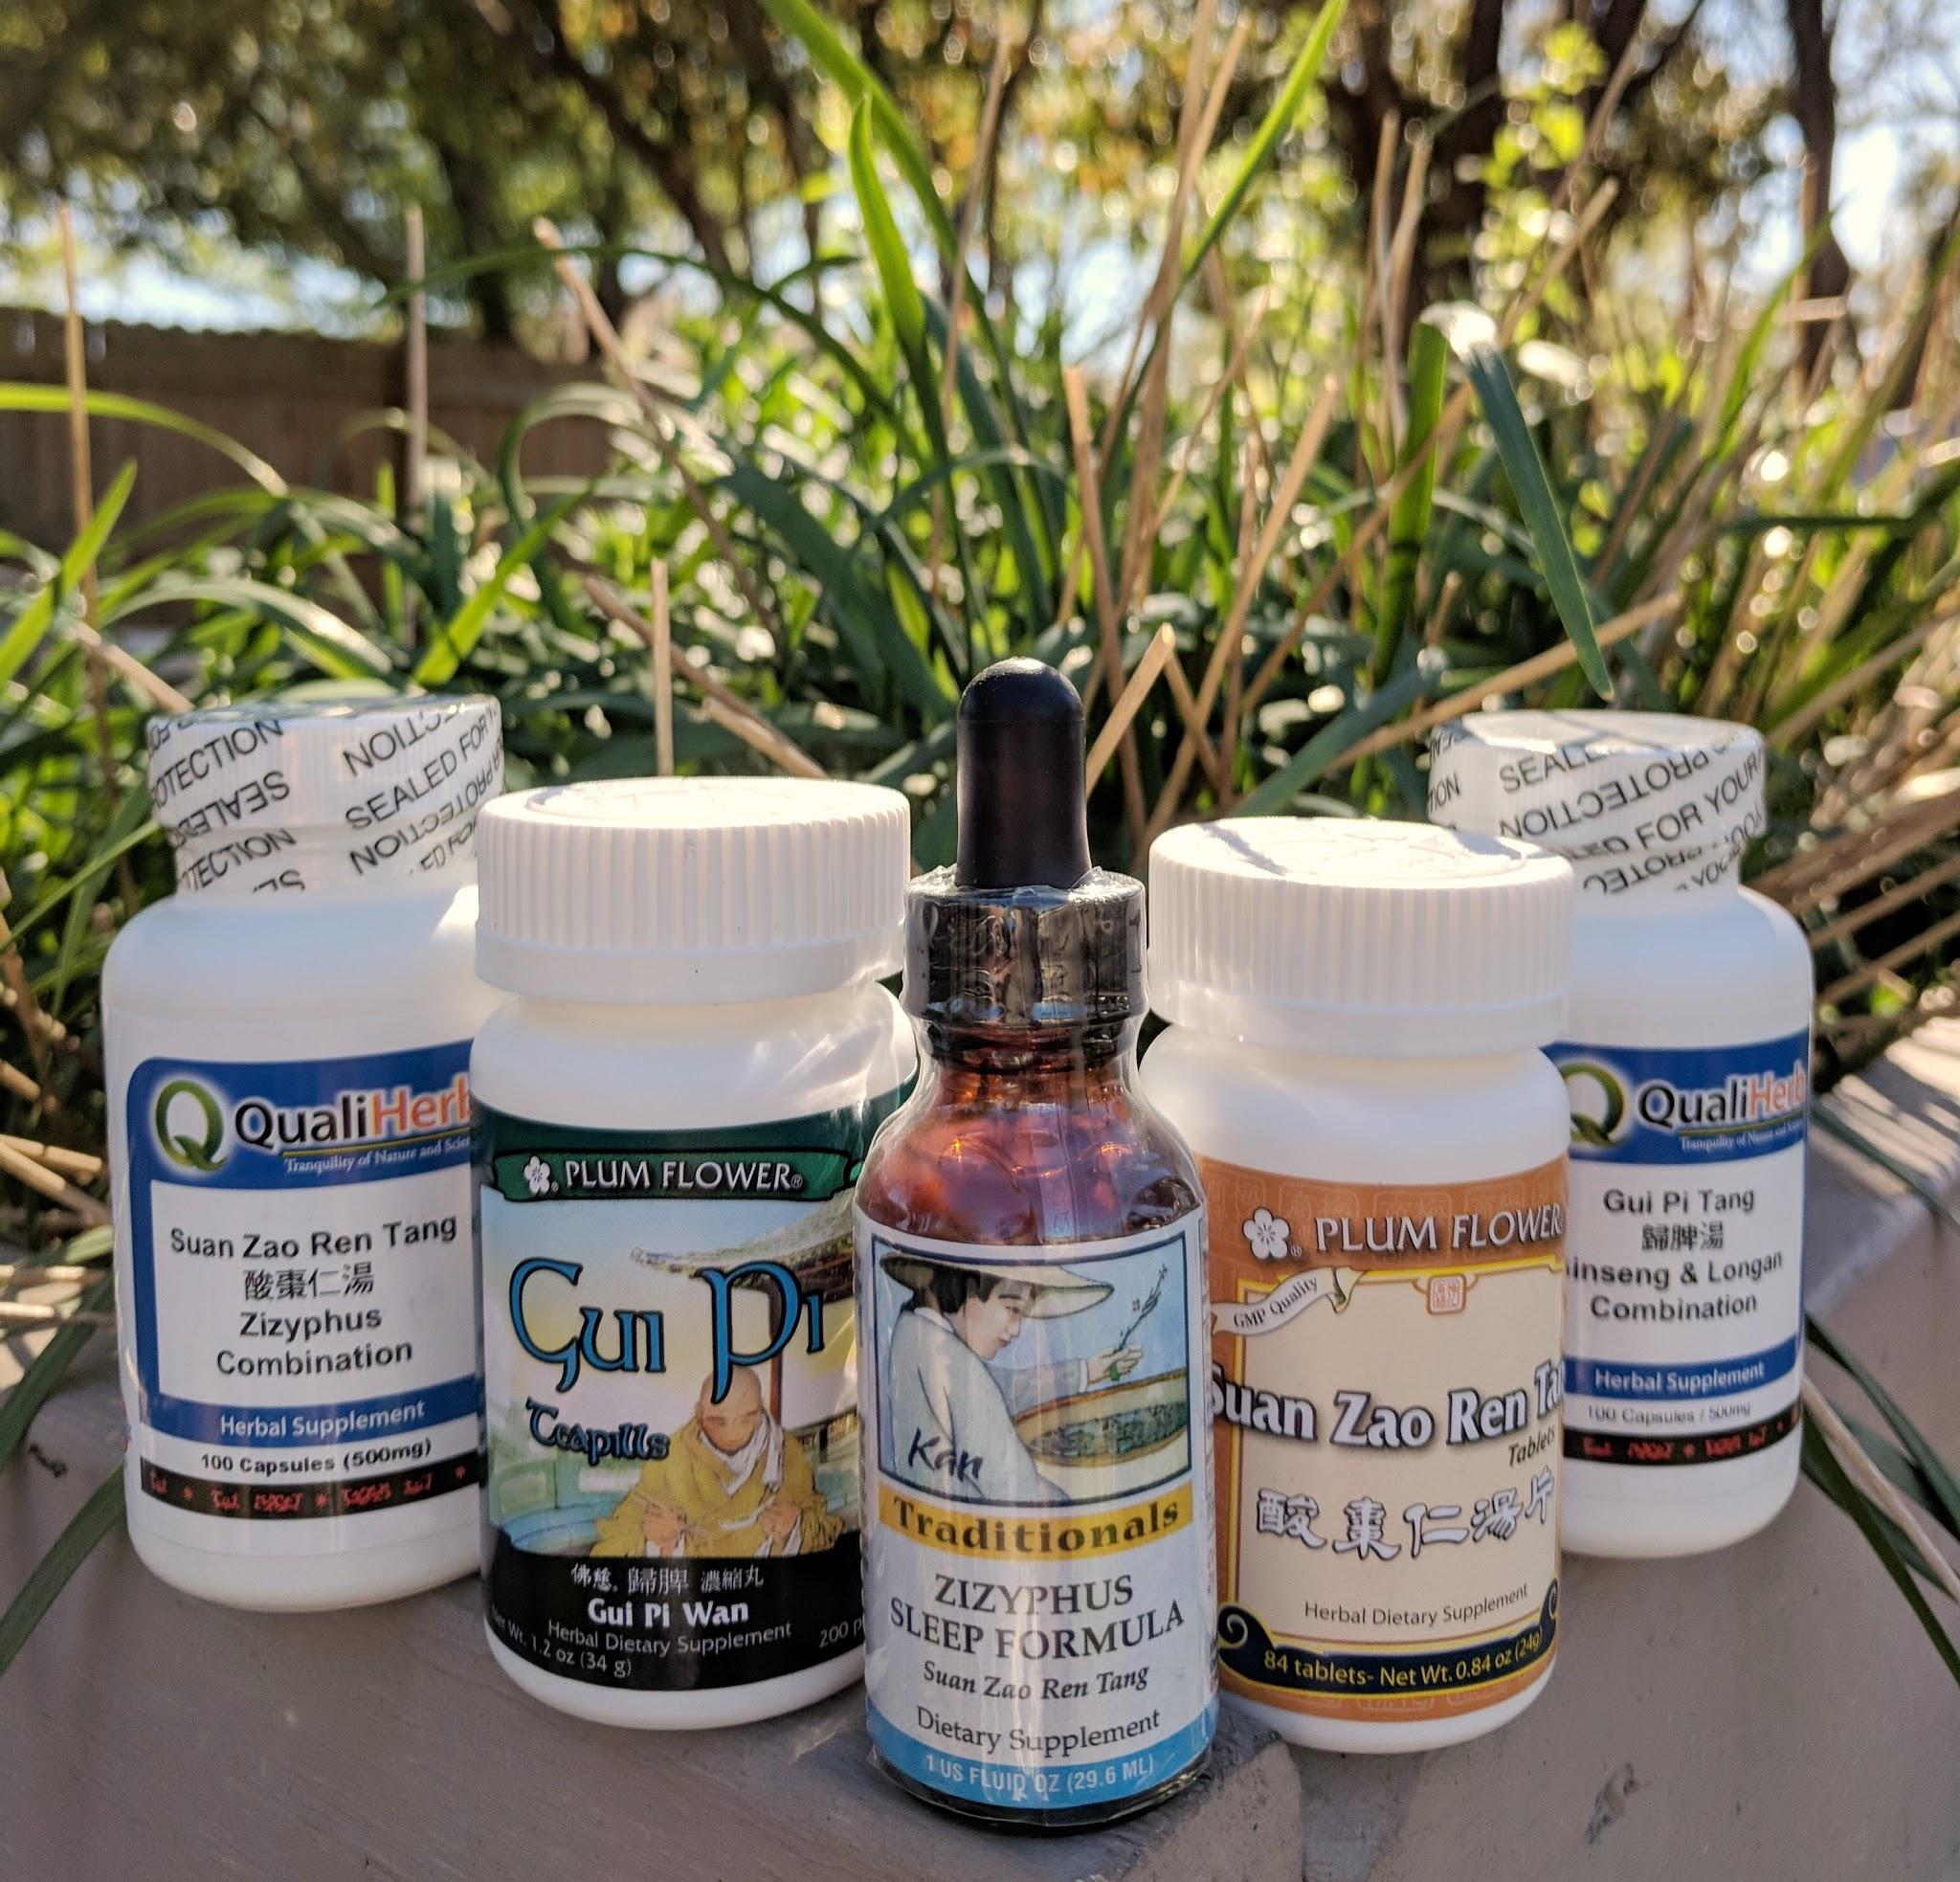 Insomnia herbs_Mar 18 newsletter.jpg